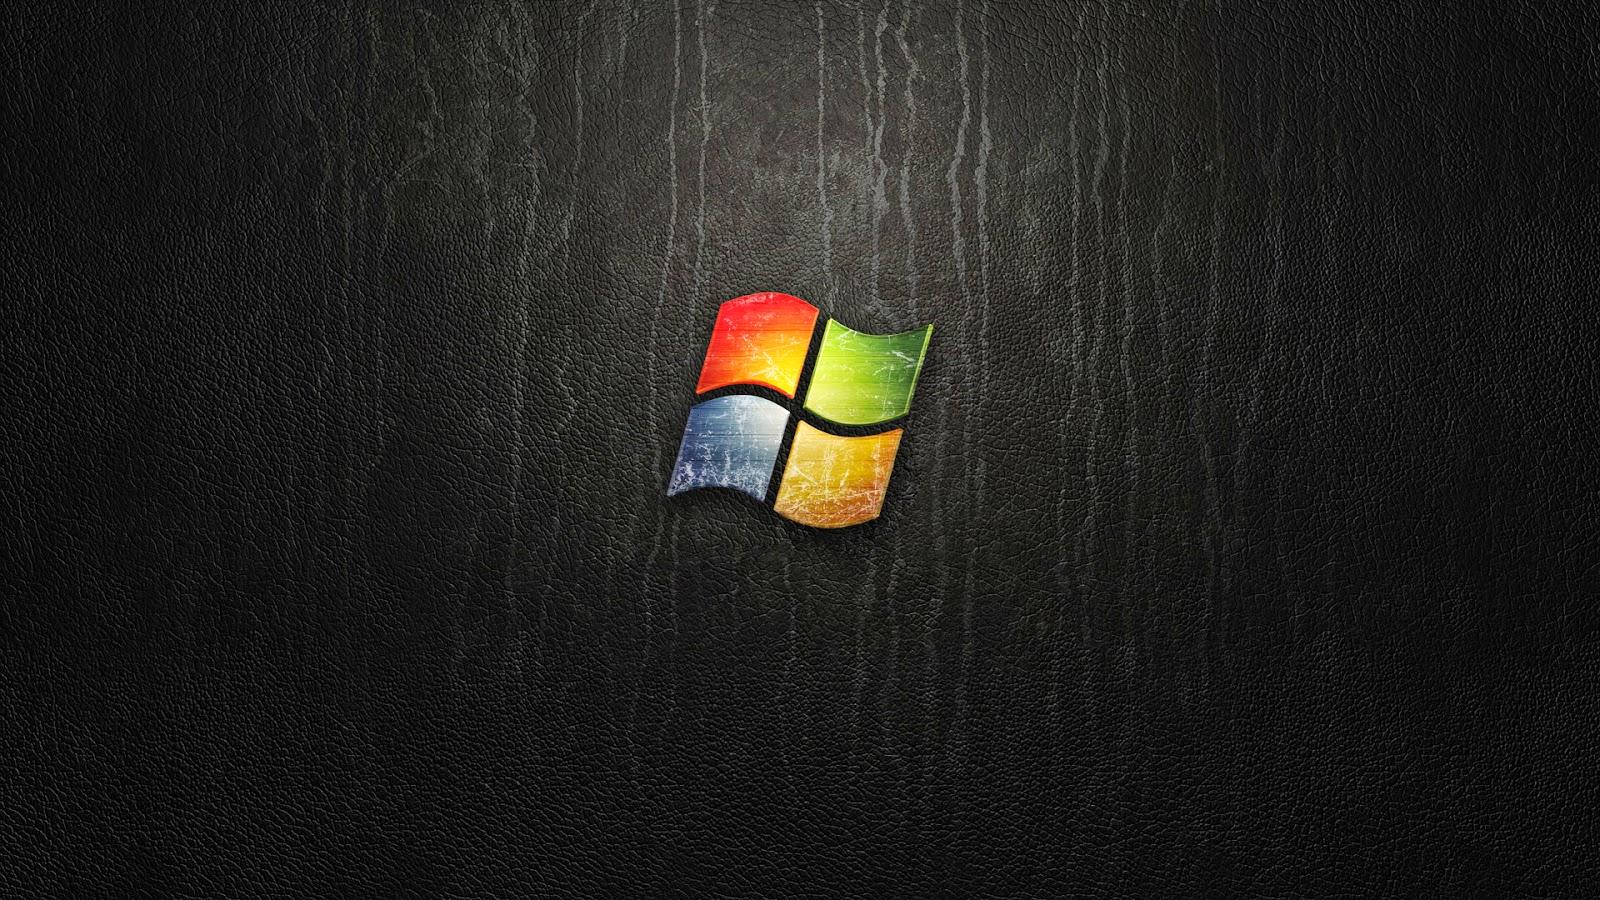 Full Hd Desktop Wallpapers Dark Windows Logo Wallpaper